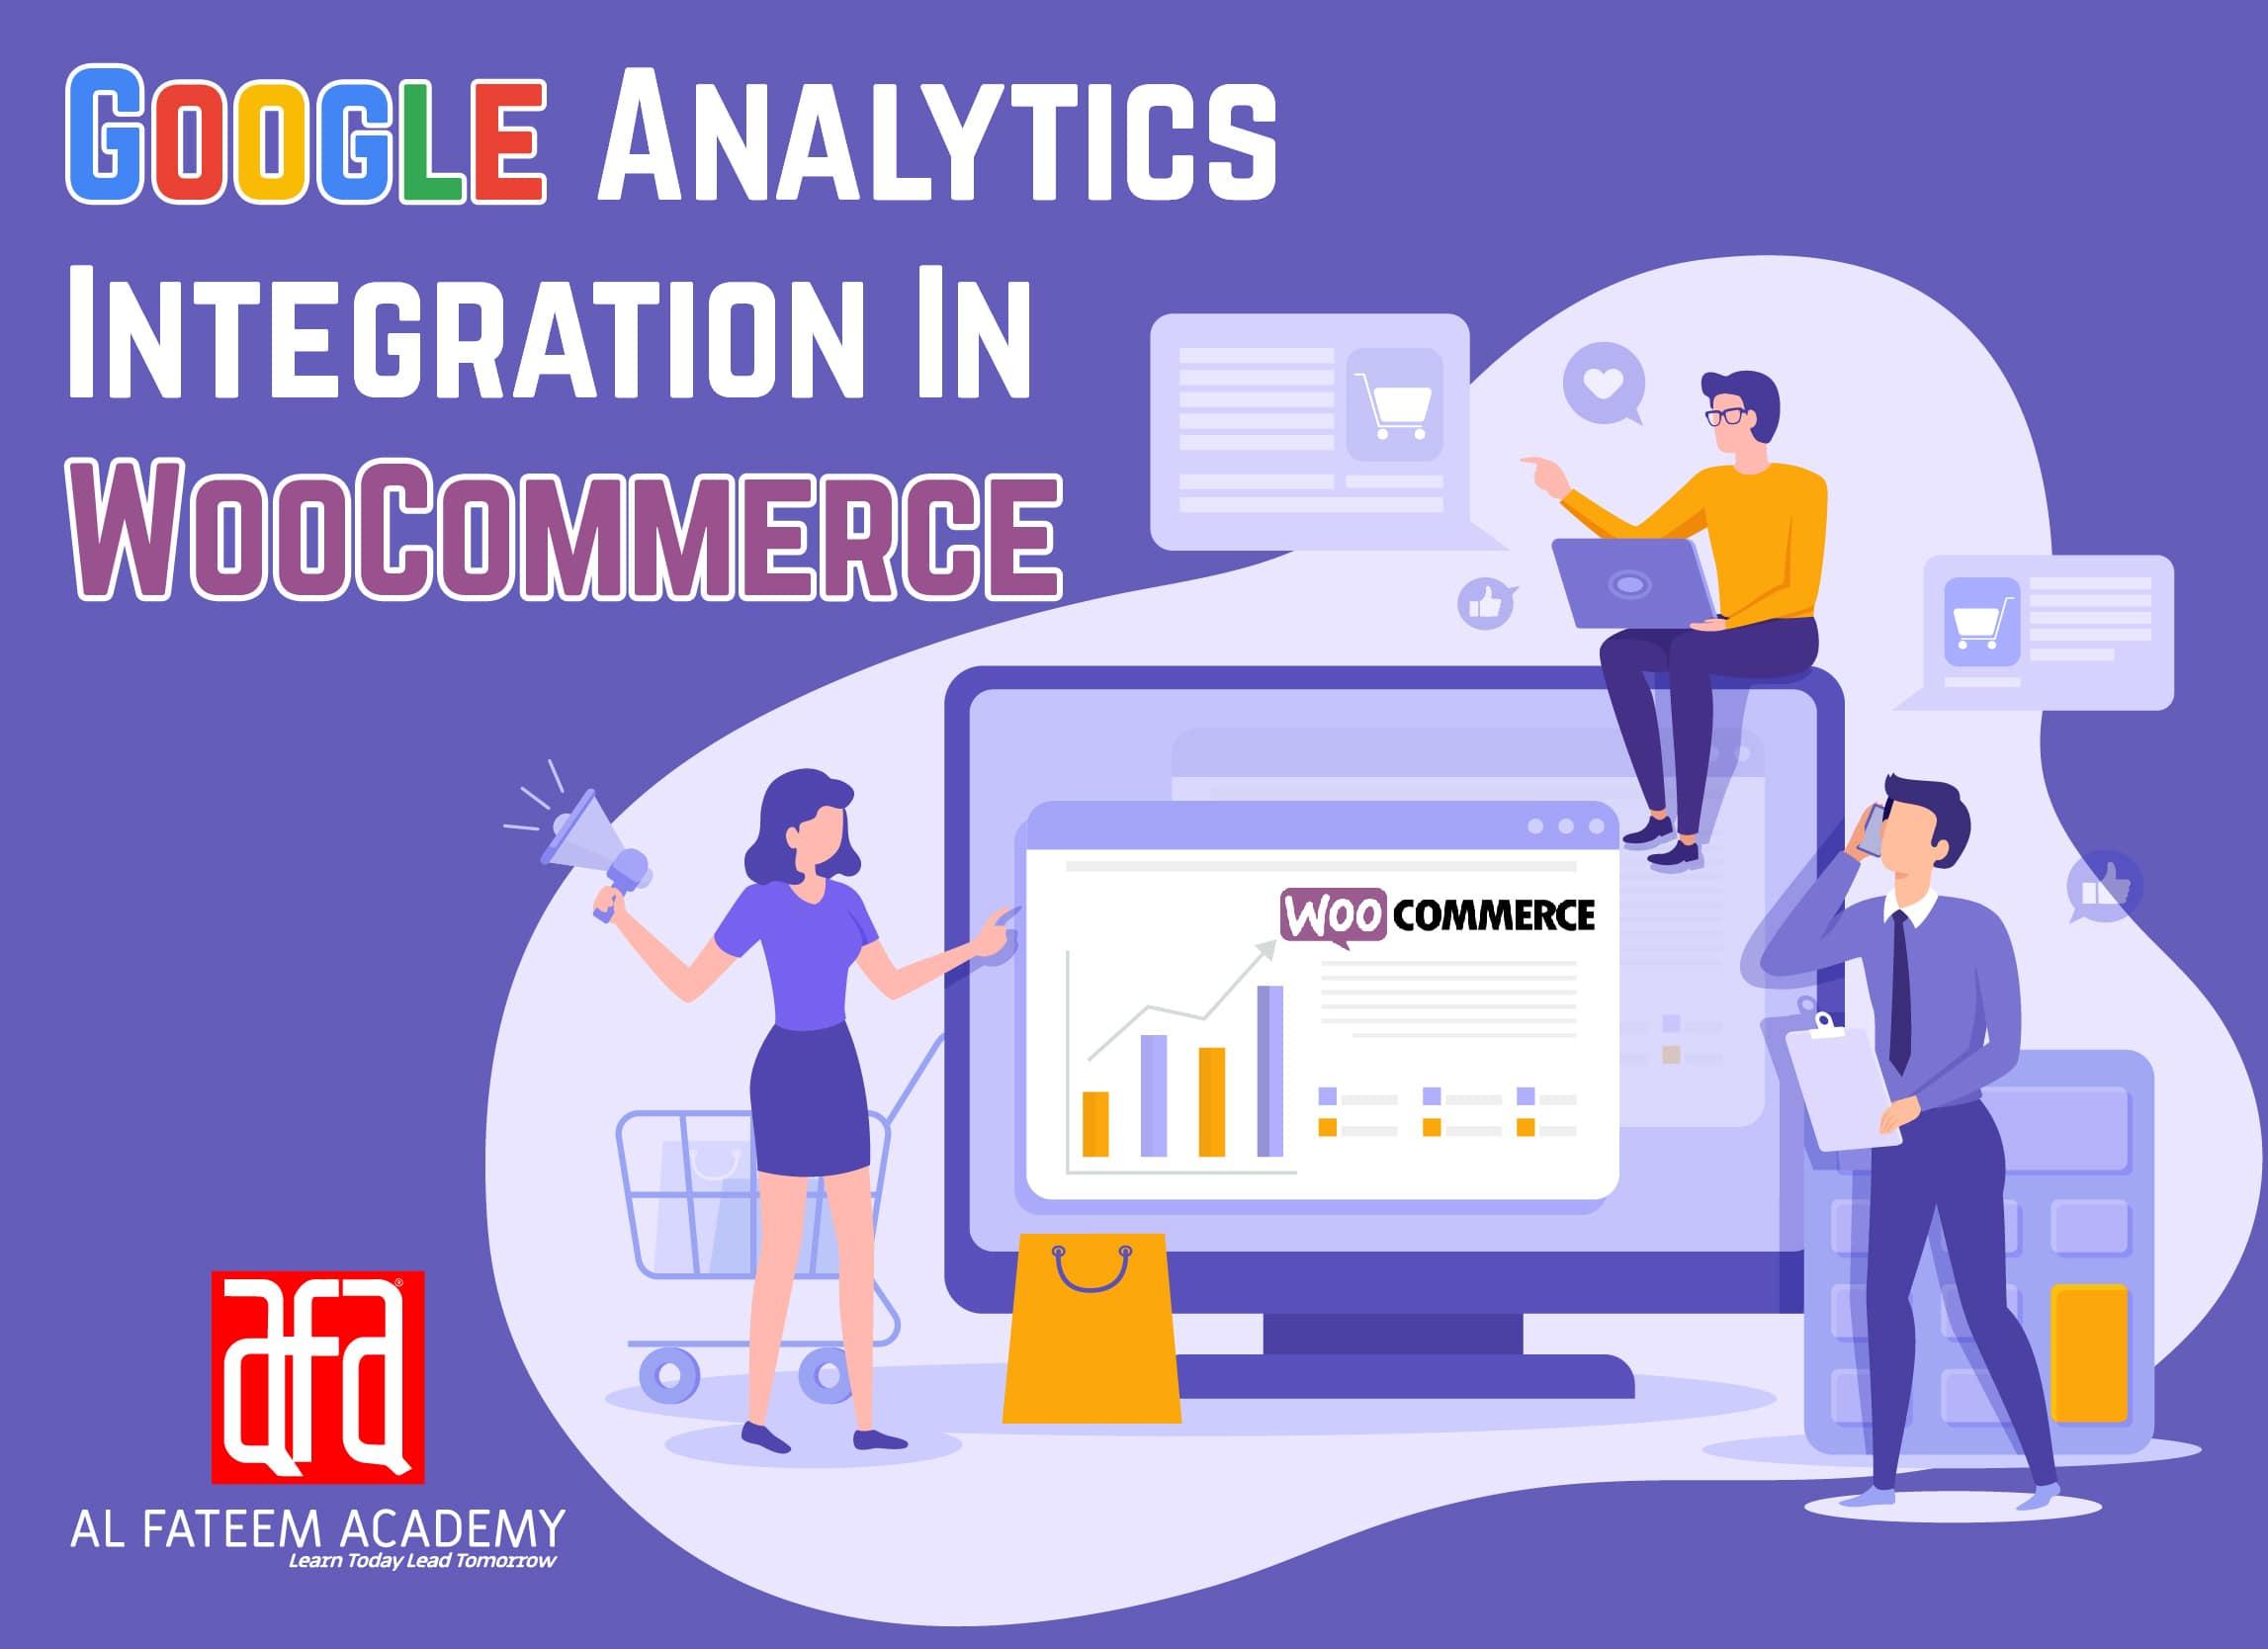 Google Analytics Integration In WooCommerce